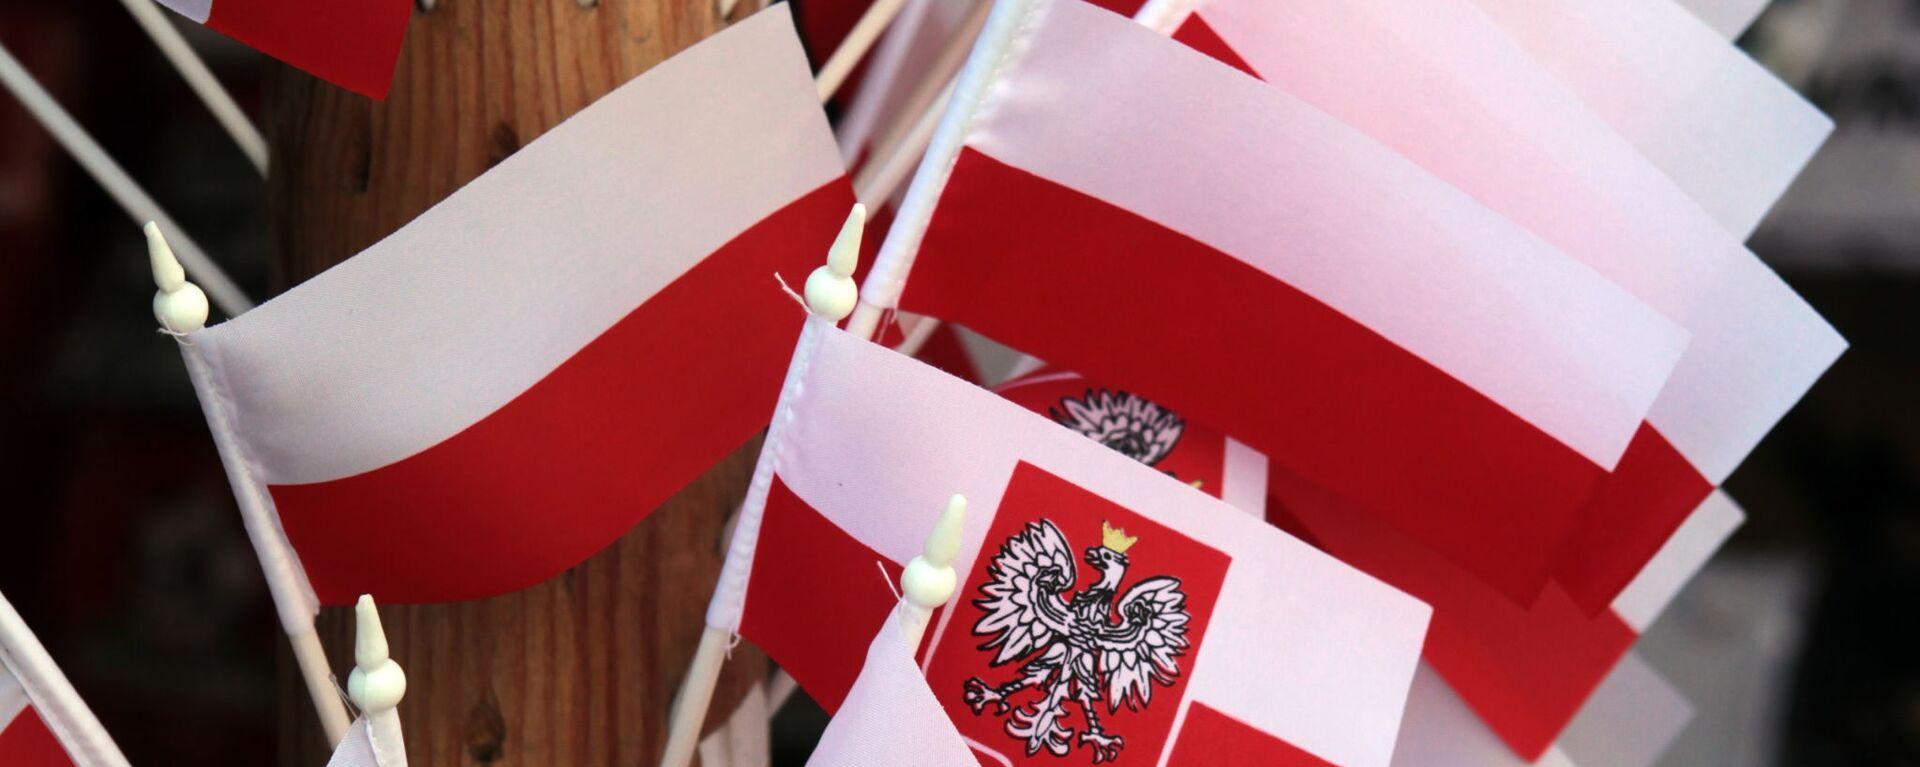 Polskie flagi - Sputnik Polska, 1920, 15.04.2021